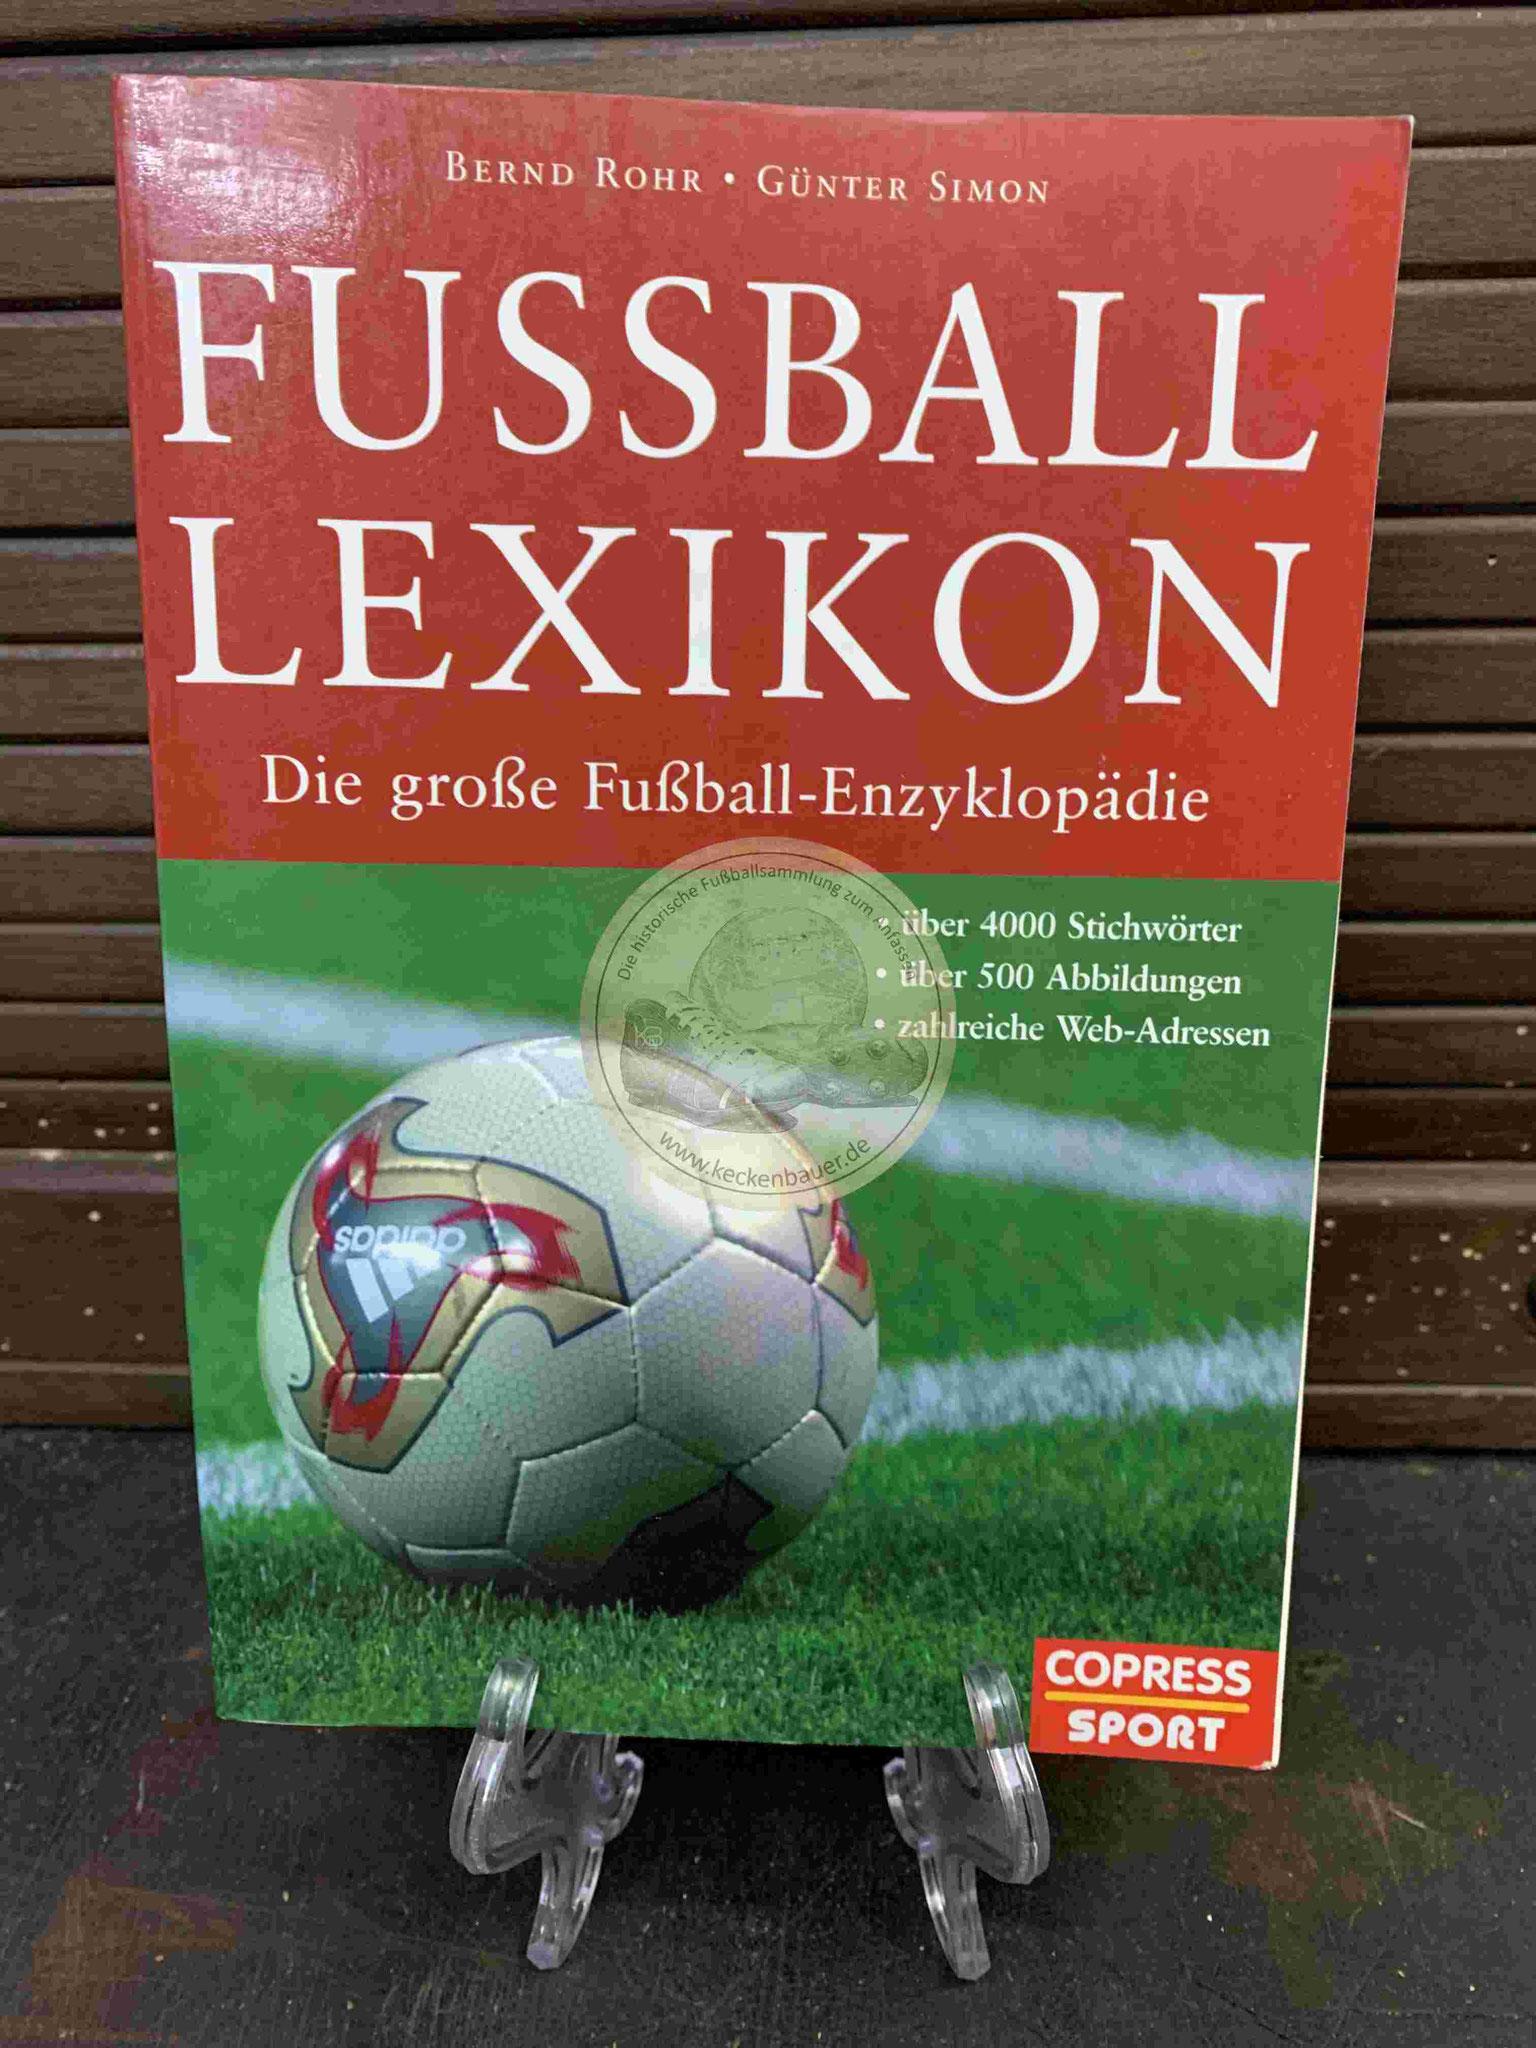 Fussball Lexikon aus dem Jahr 2004